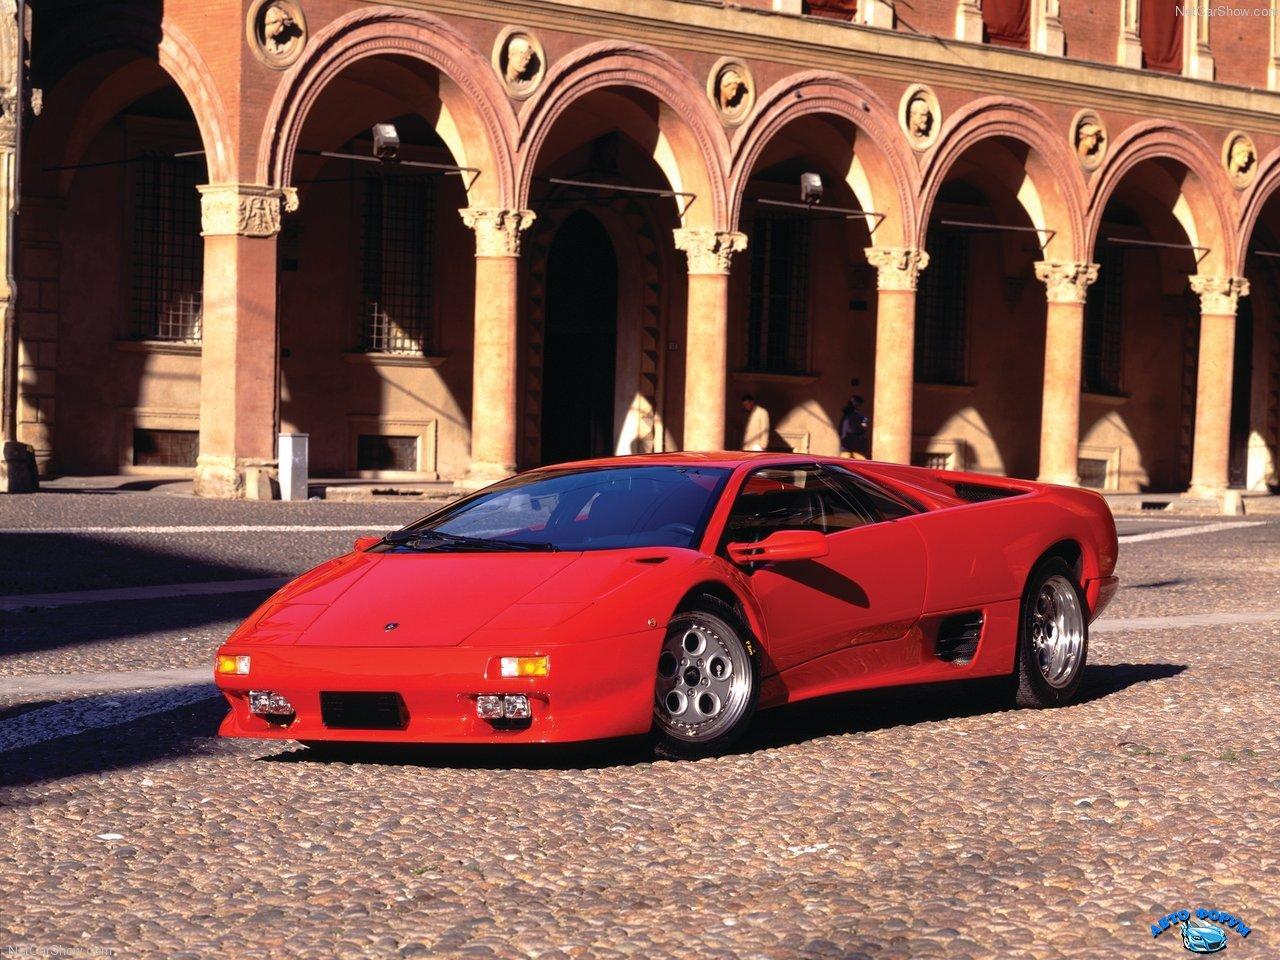 Lamborghini-Diablo_VT_1993_1280x960_wallpaper_01.jpg